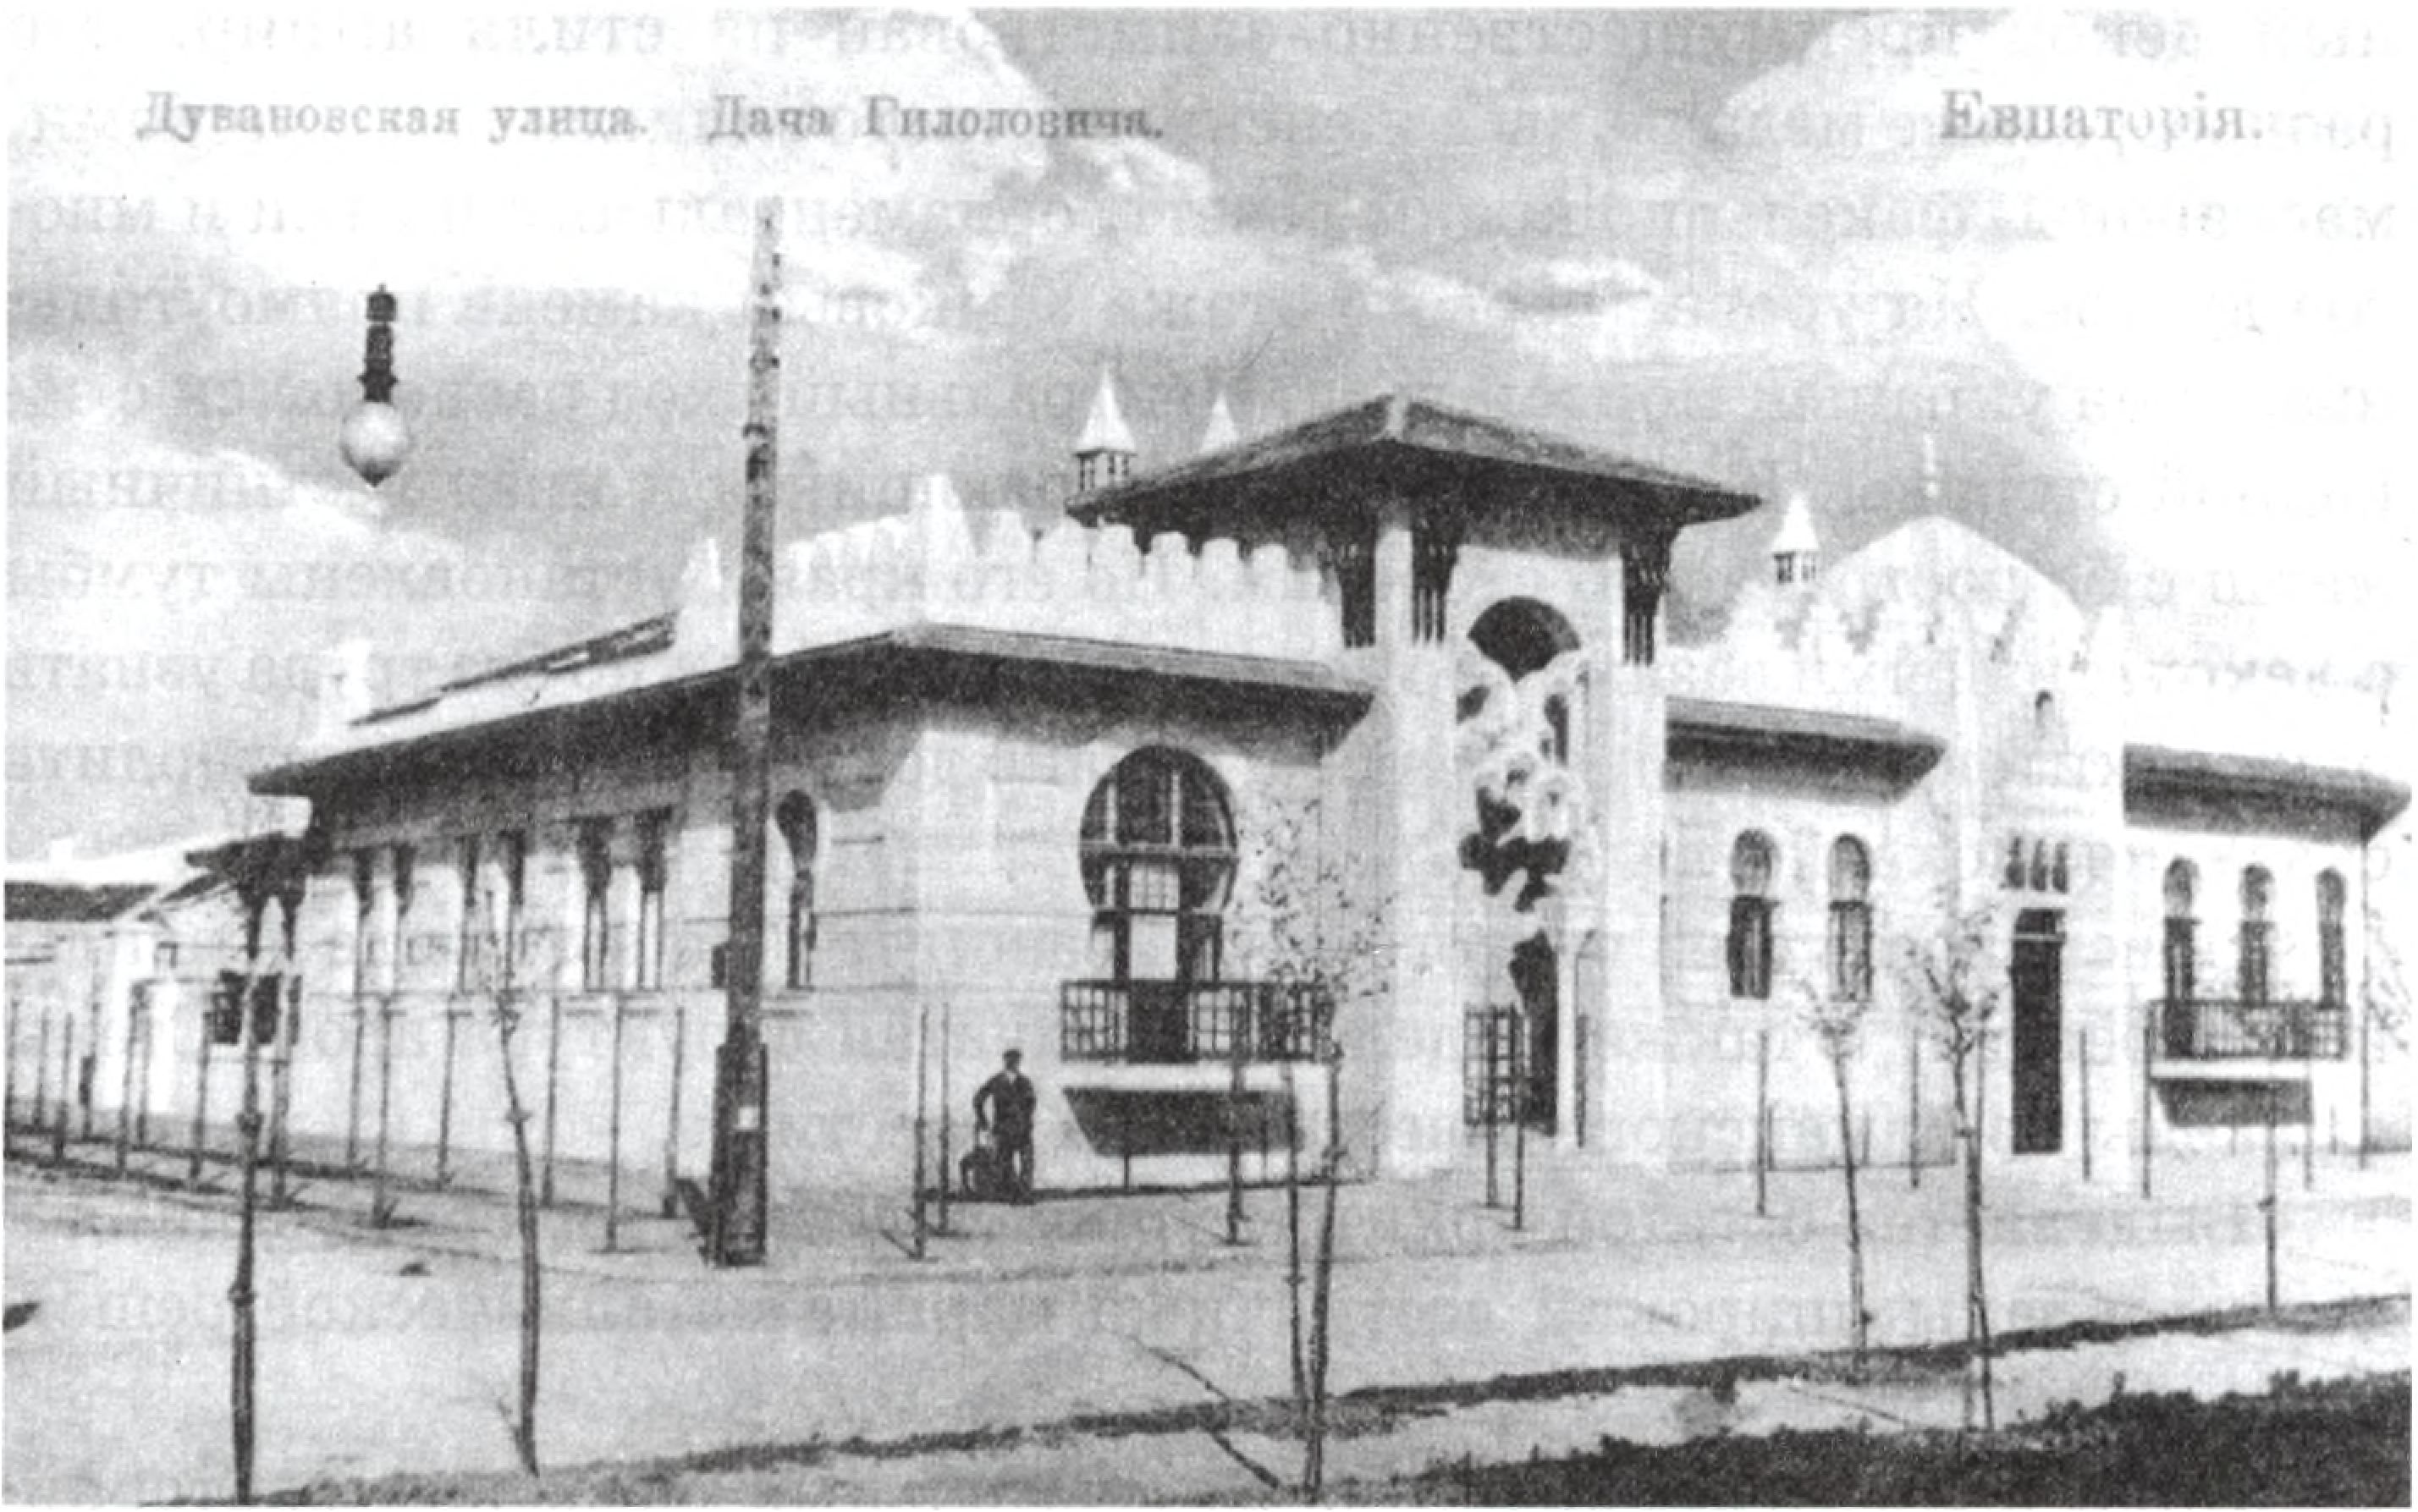 Дача Ю. Гелеловича на Дуванской улице. Архитектор А.Л. Генрих. 1910—1912 гг.